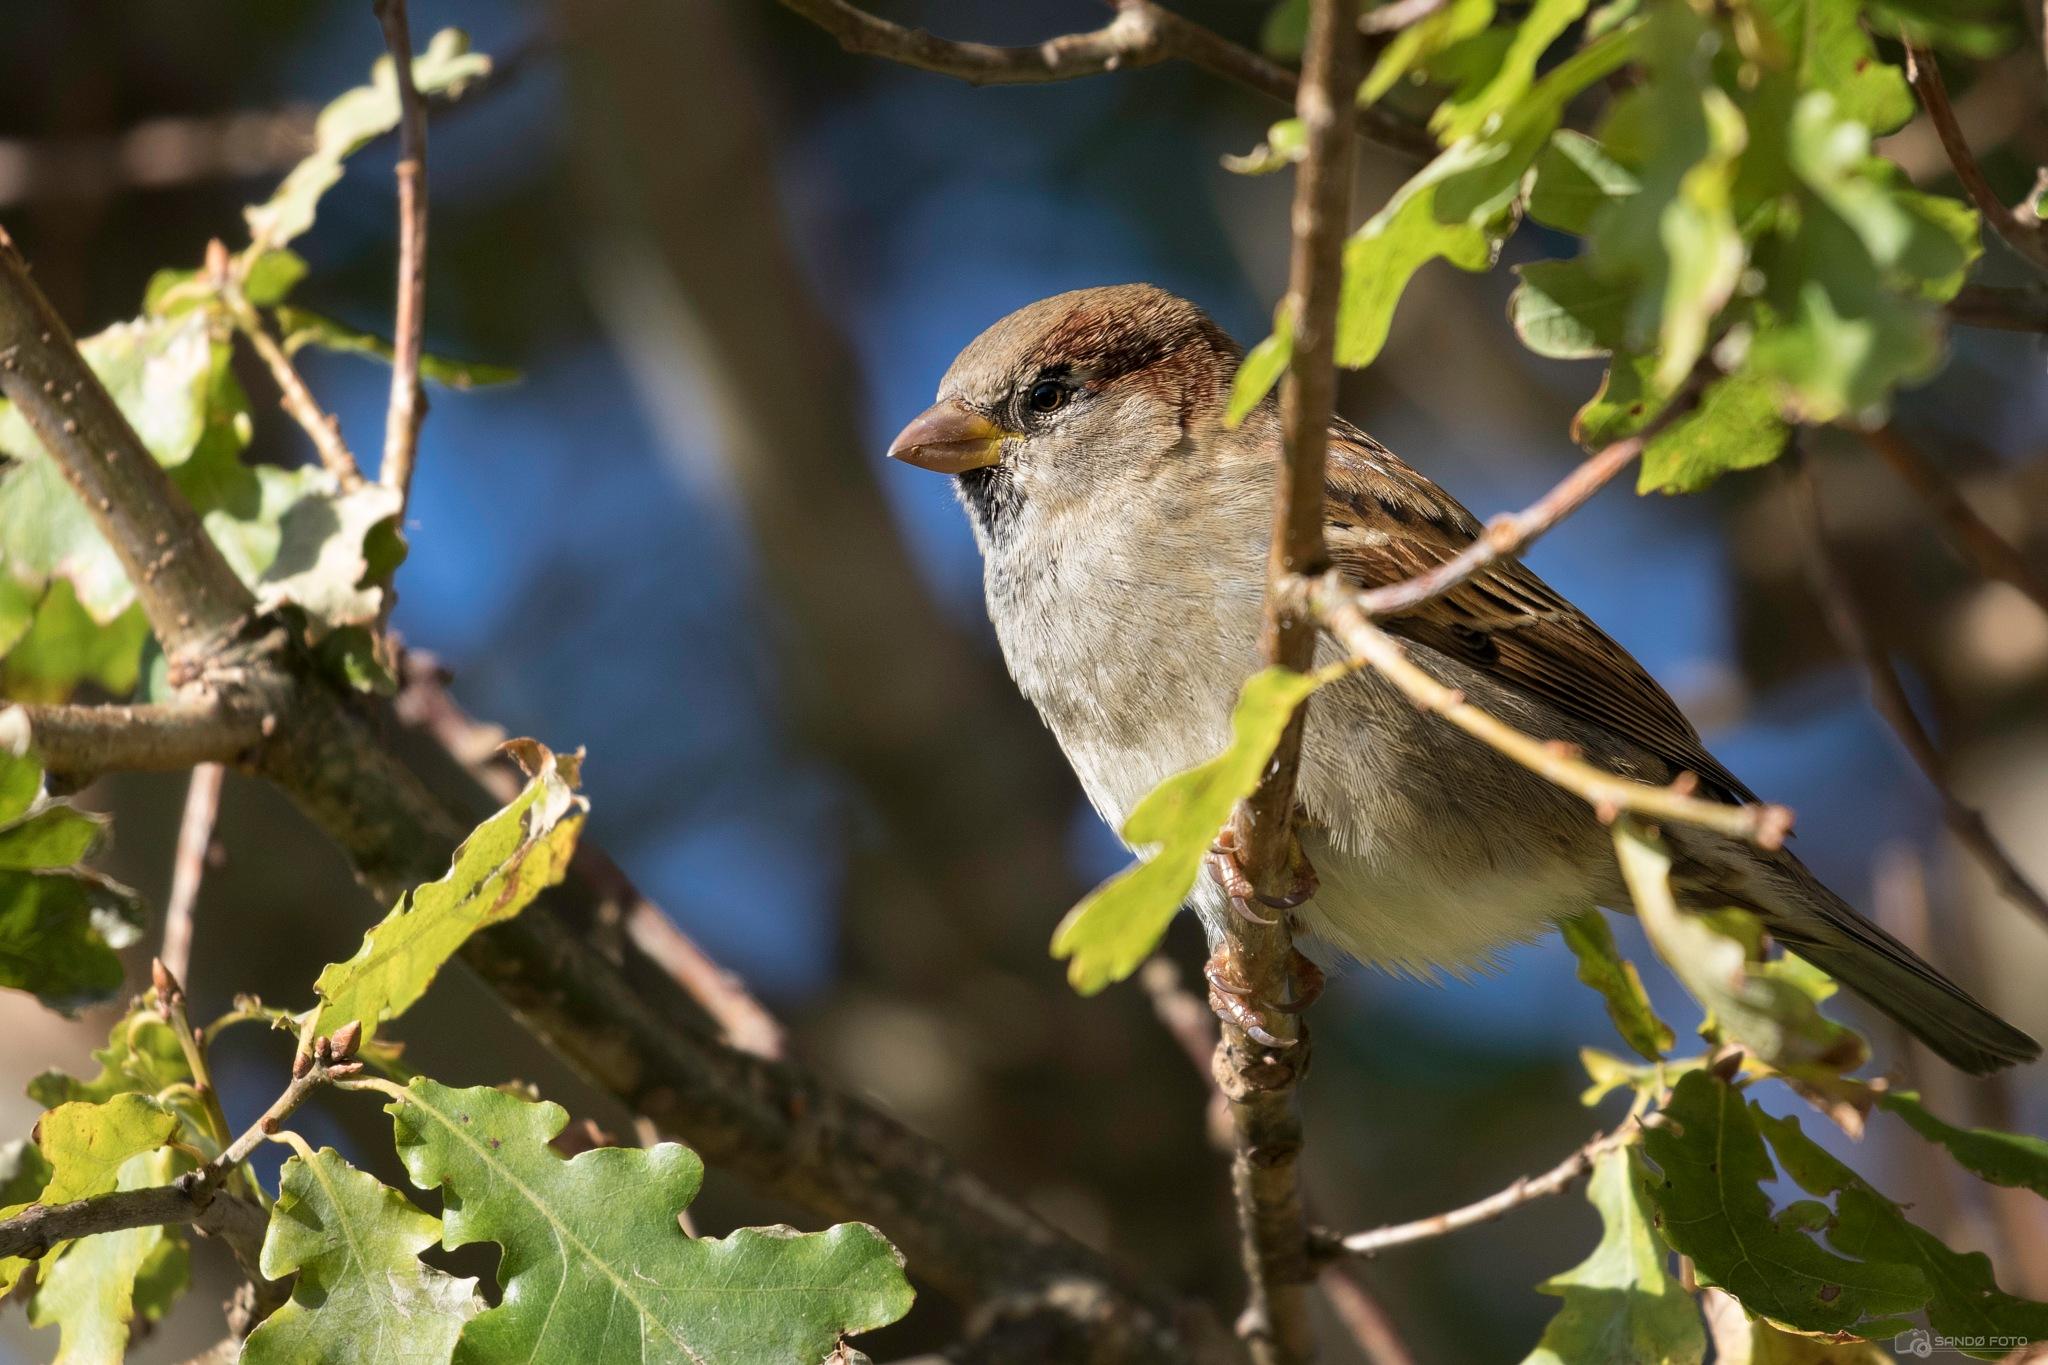 Sparrow enjoying the sun by tjsandofoto